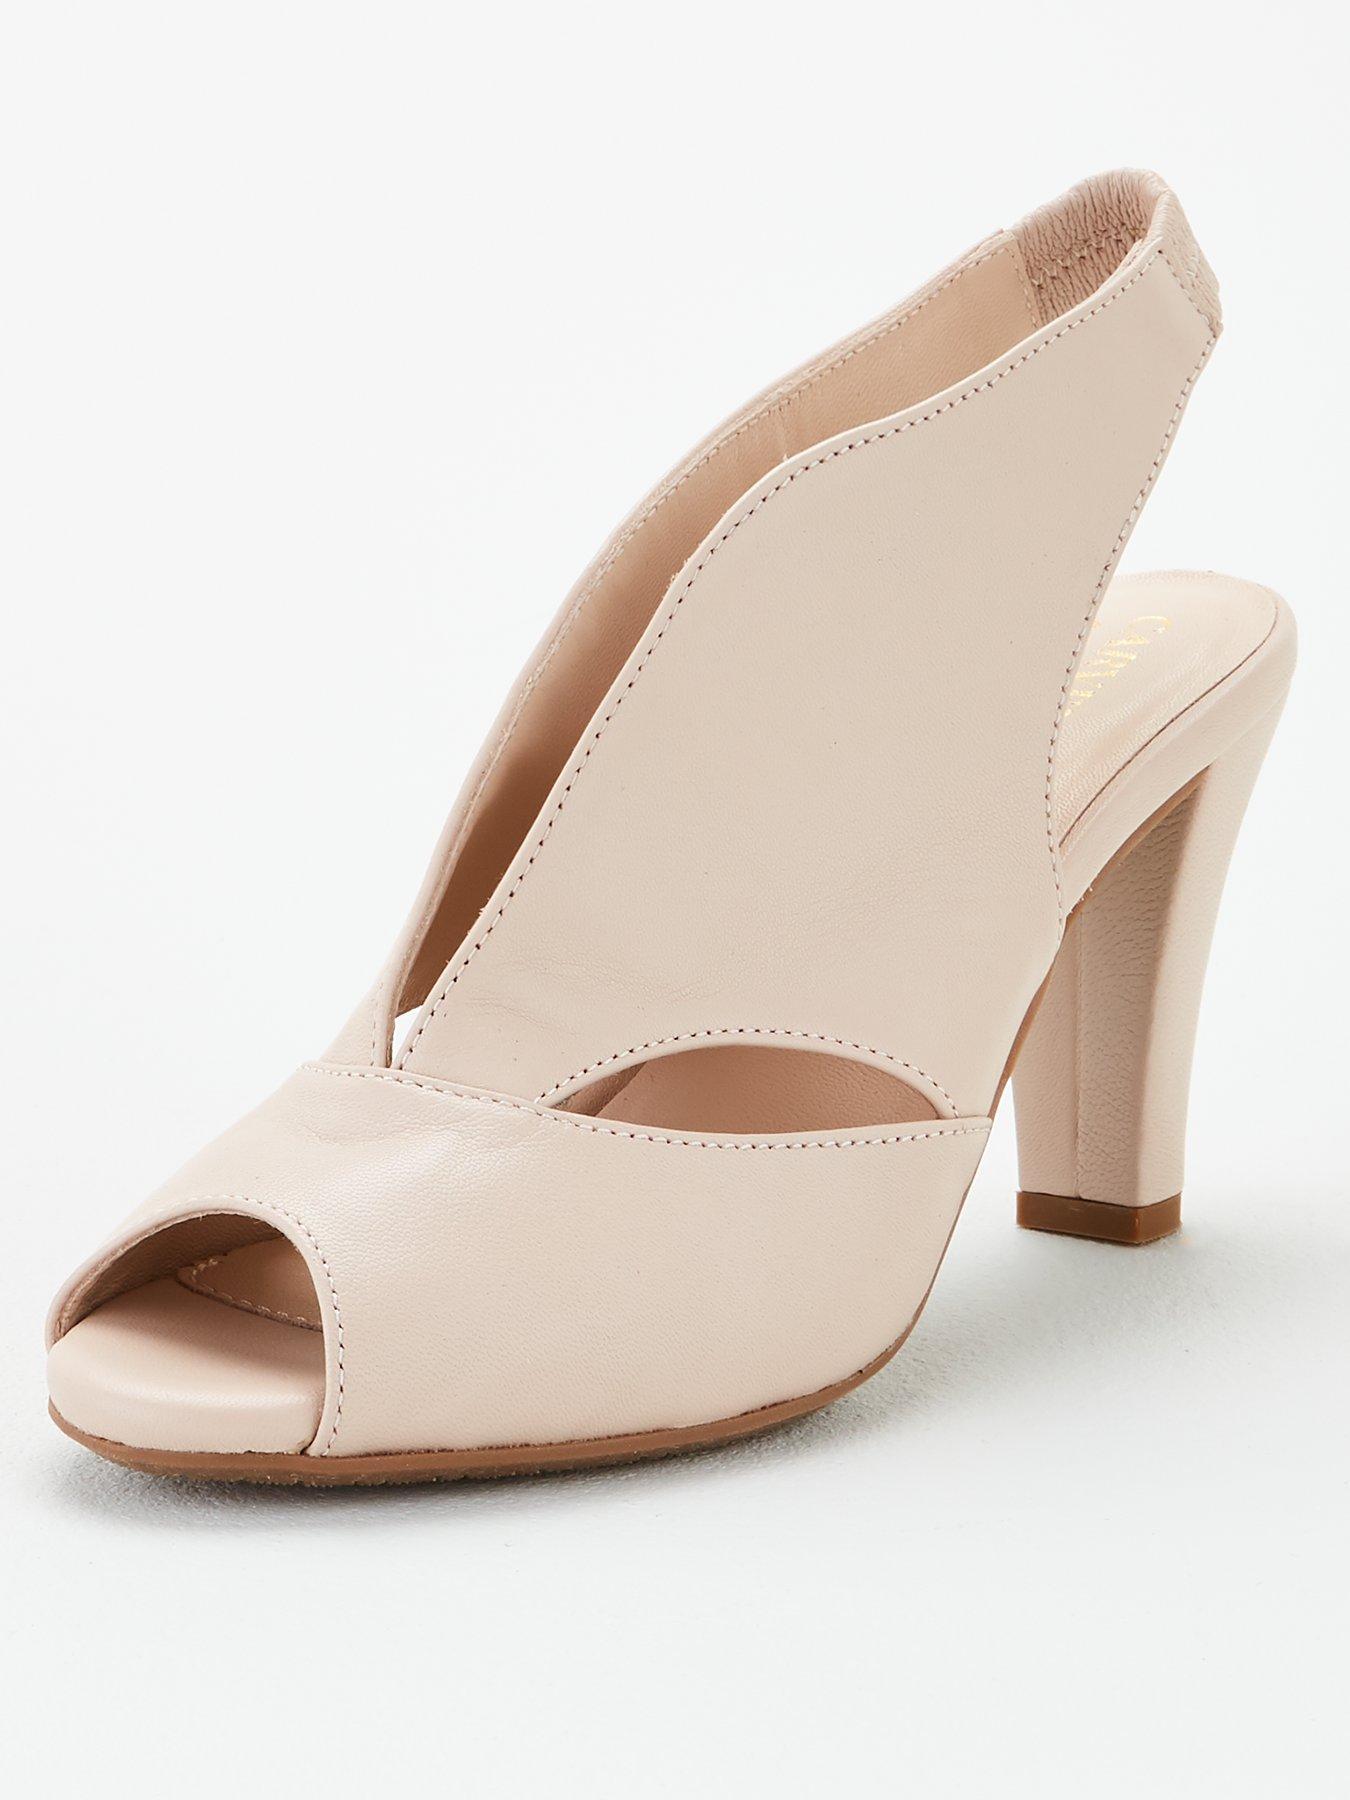 Clearance   Kurt geiger   Shoes \u0026 boots